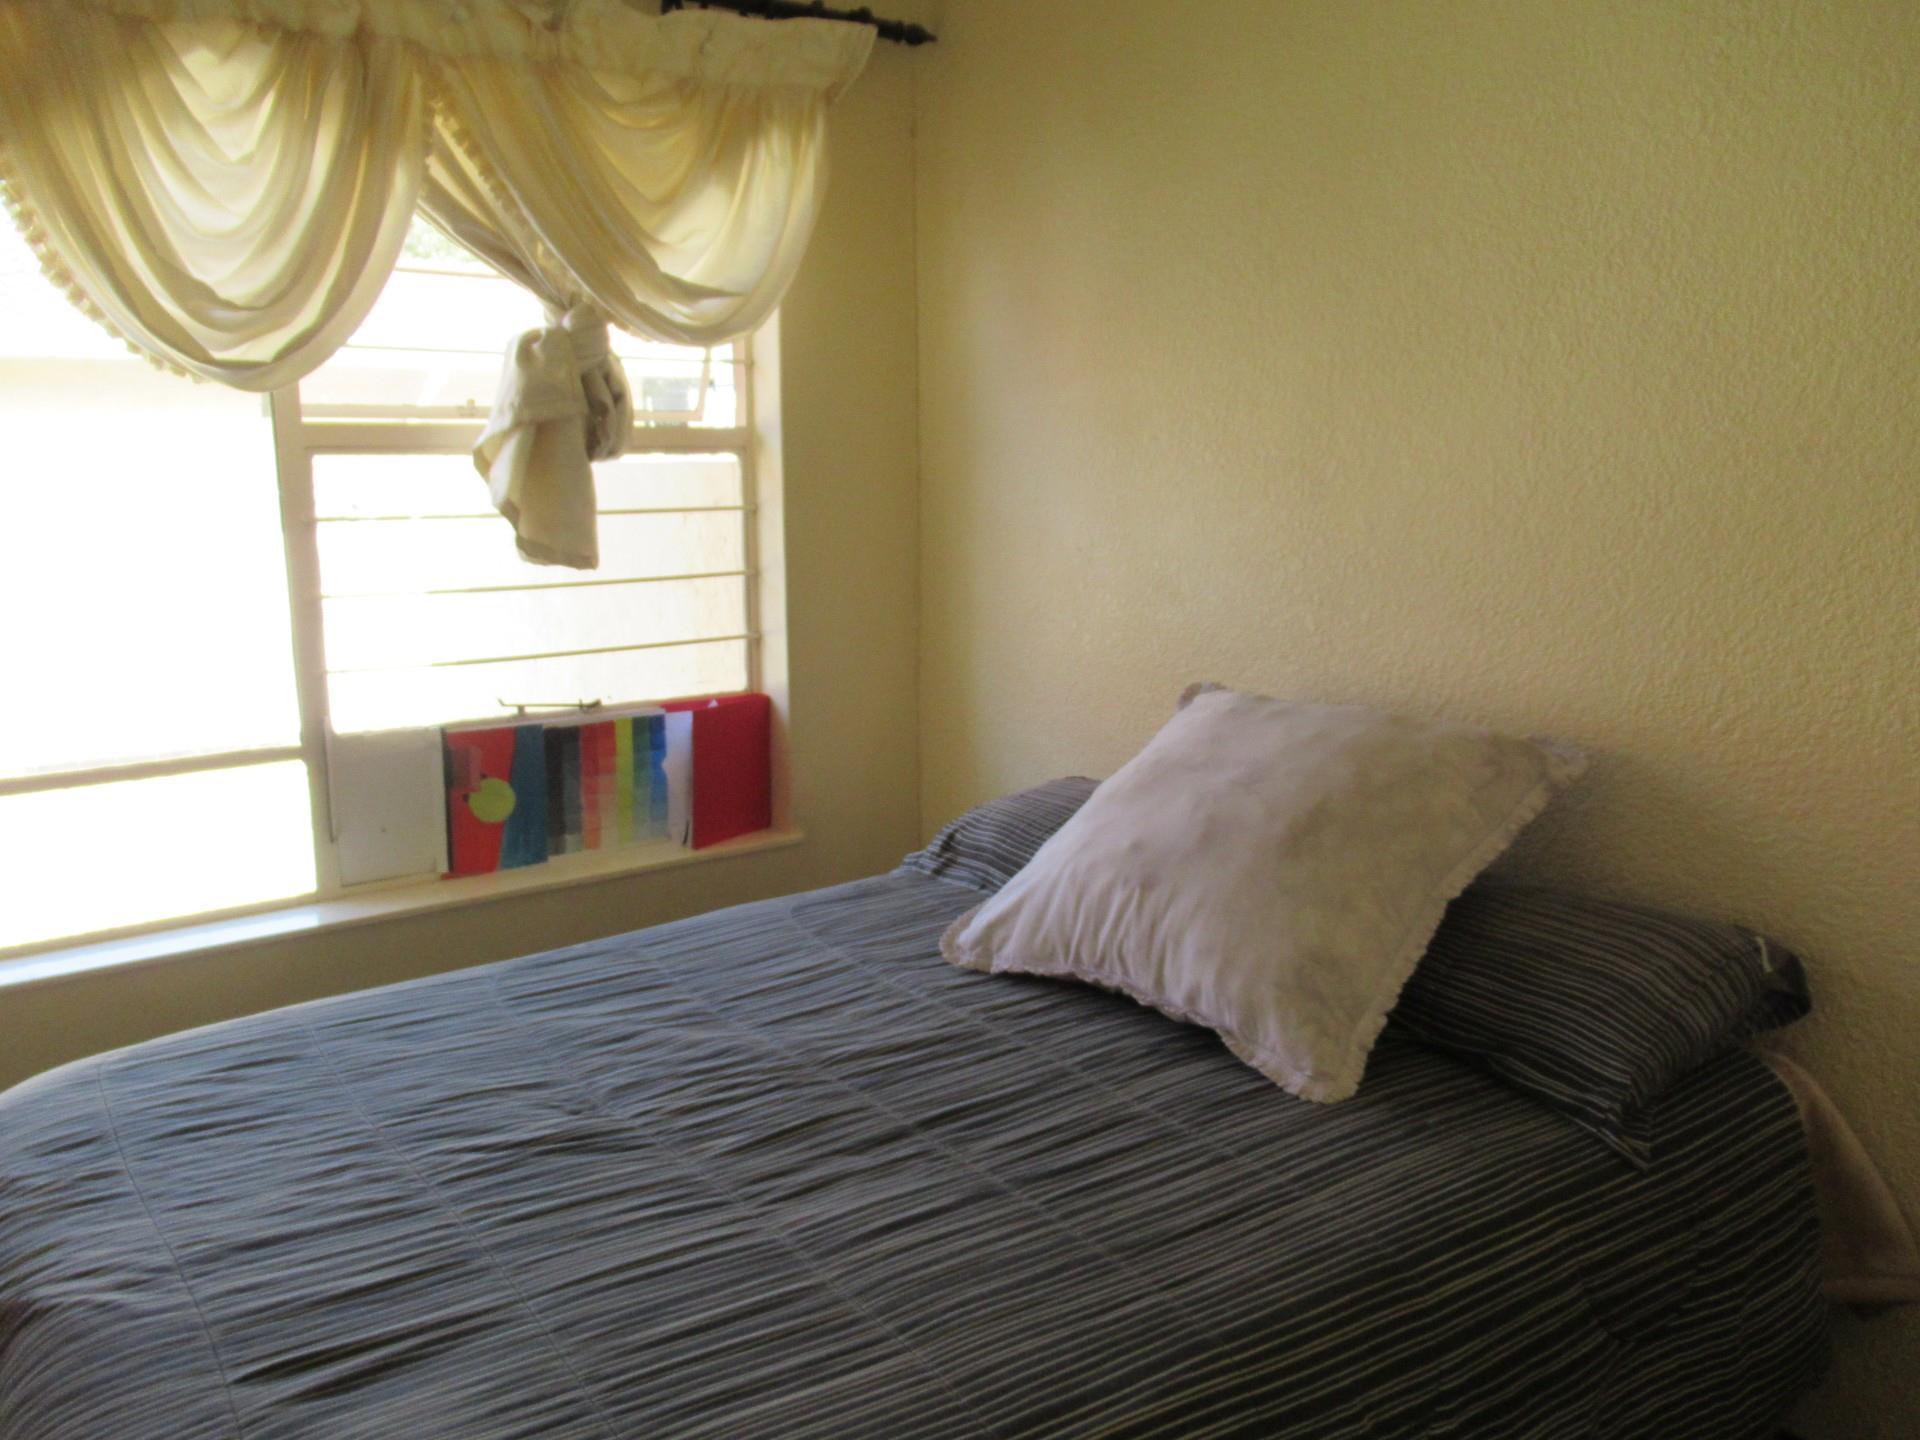 5 Bedroom House For Sale in Ridgeway